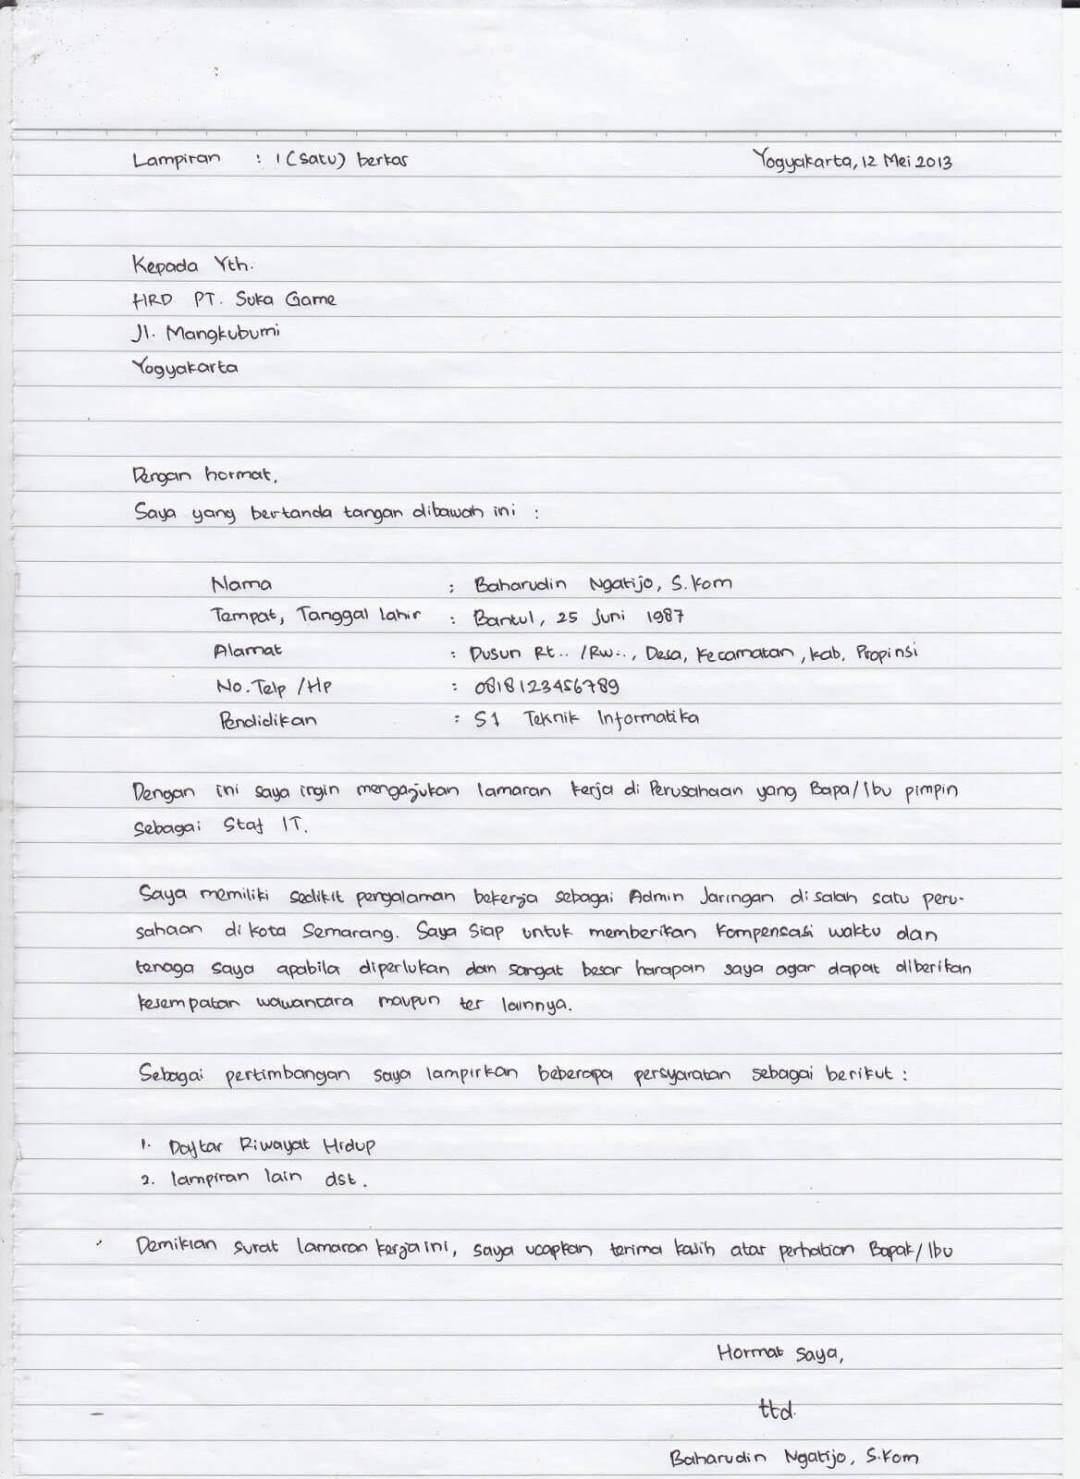 Contoh Cv Lamaran Kerja Belum Ada Pengalaman Best Resume Examples